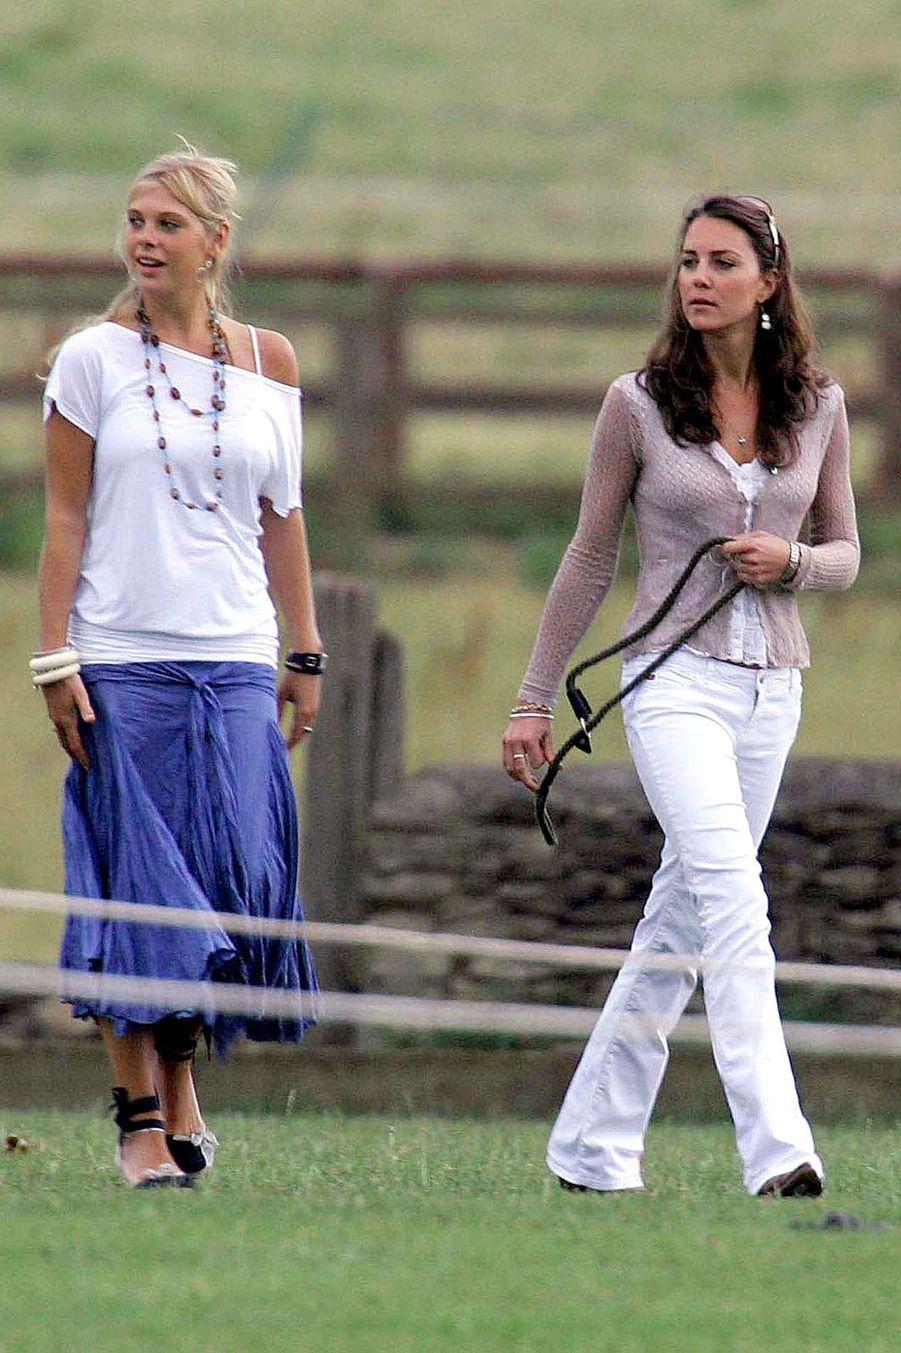 Kate Middleton et Chelsy Davy, l'ex du prince Harry, en juillet 2006